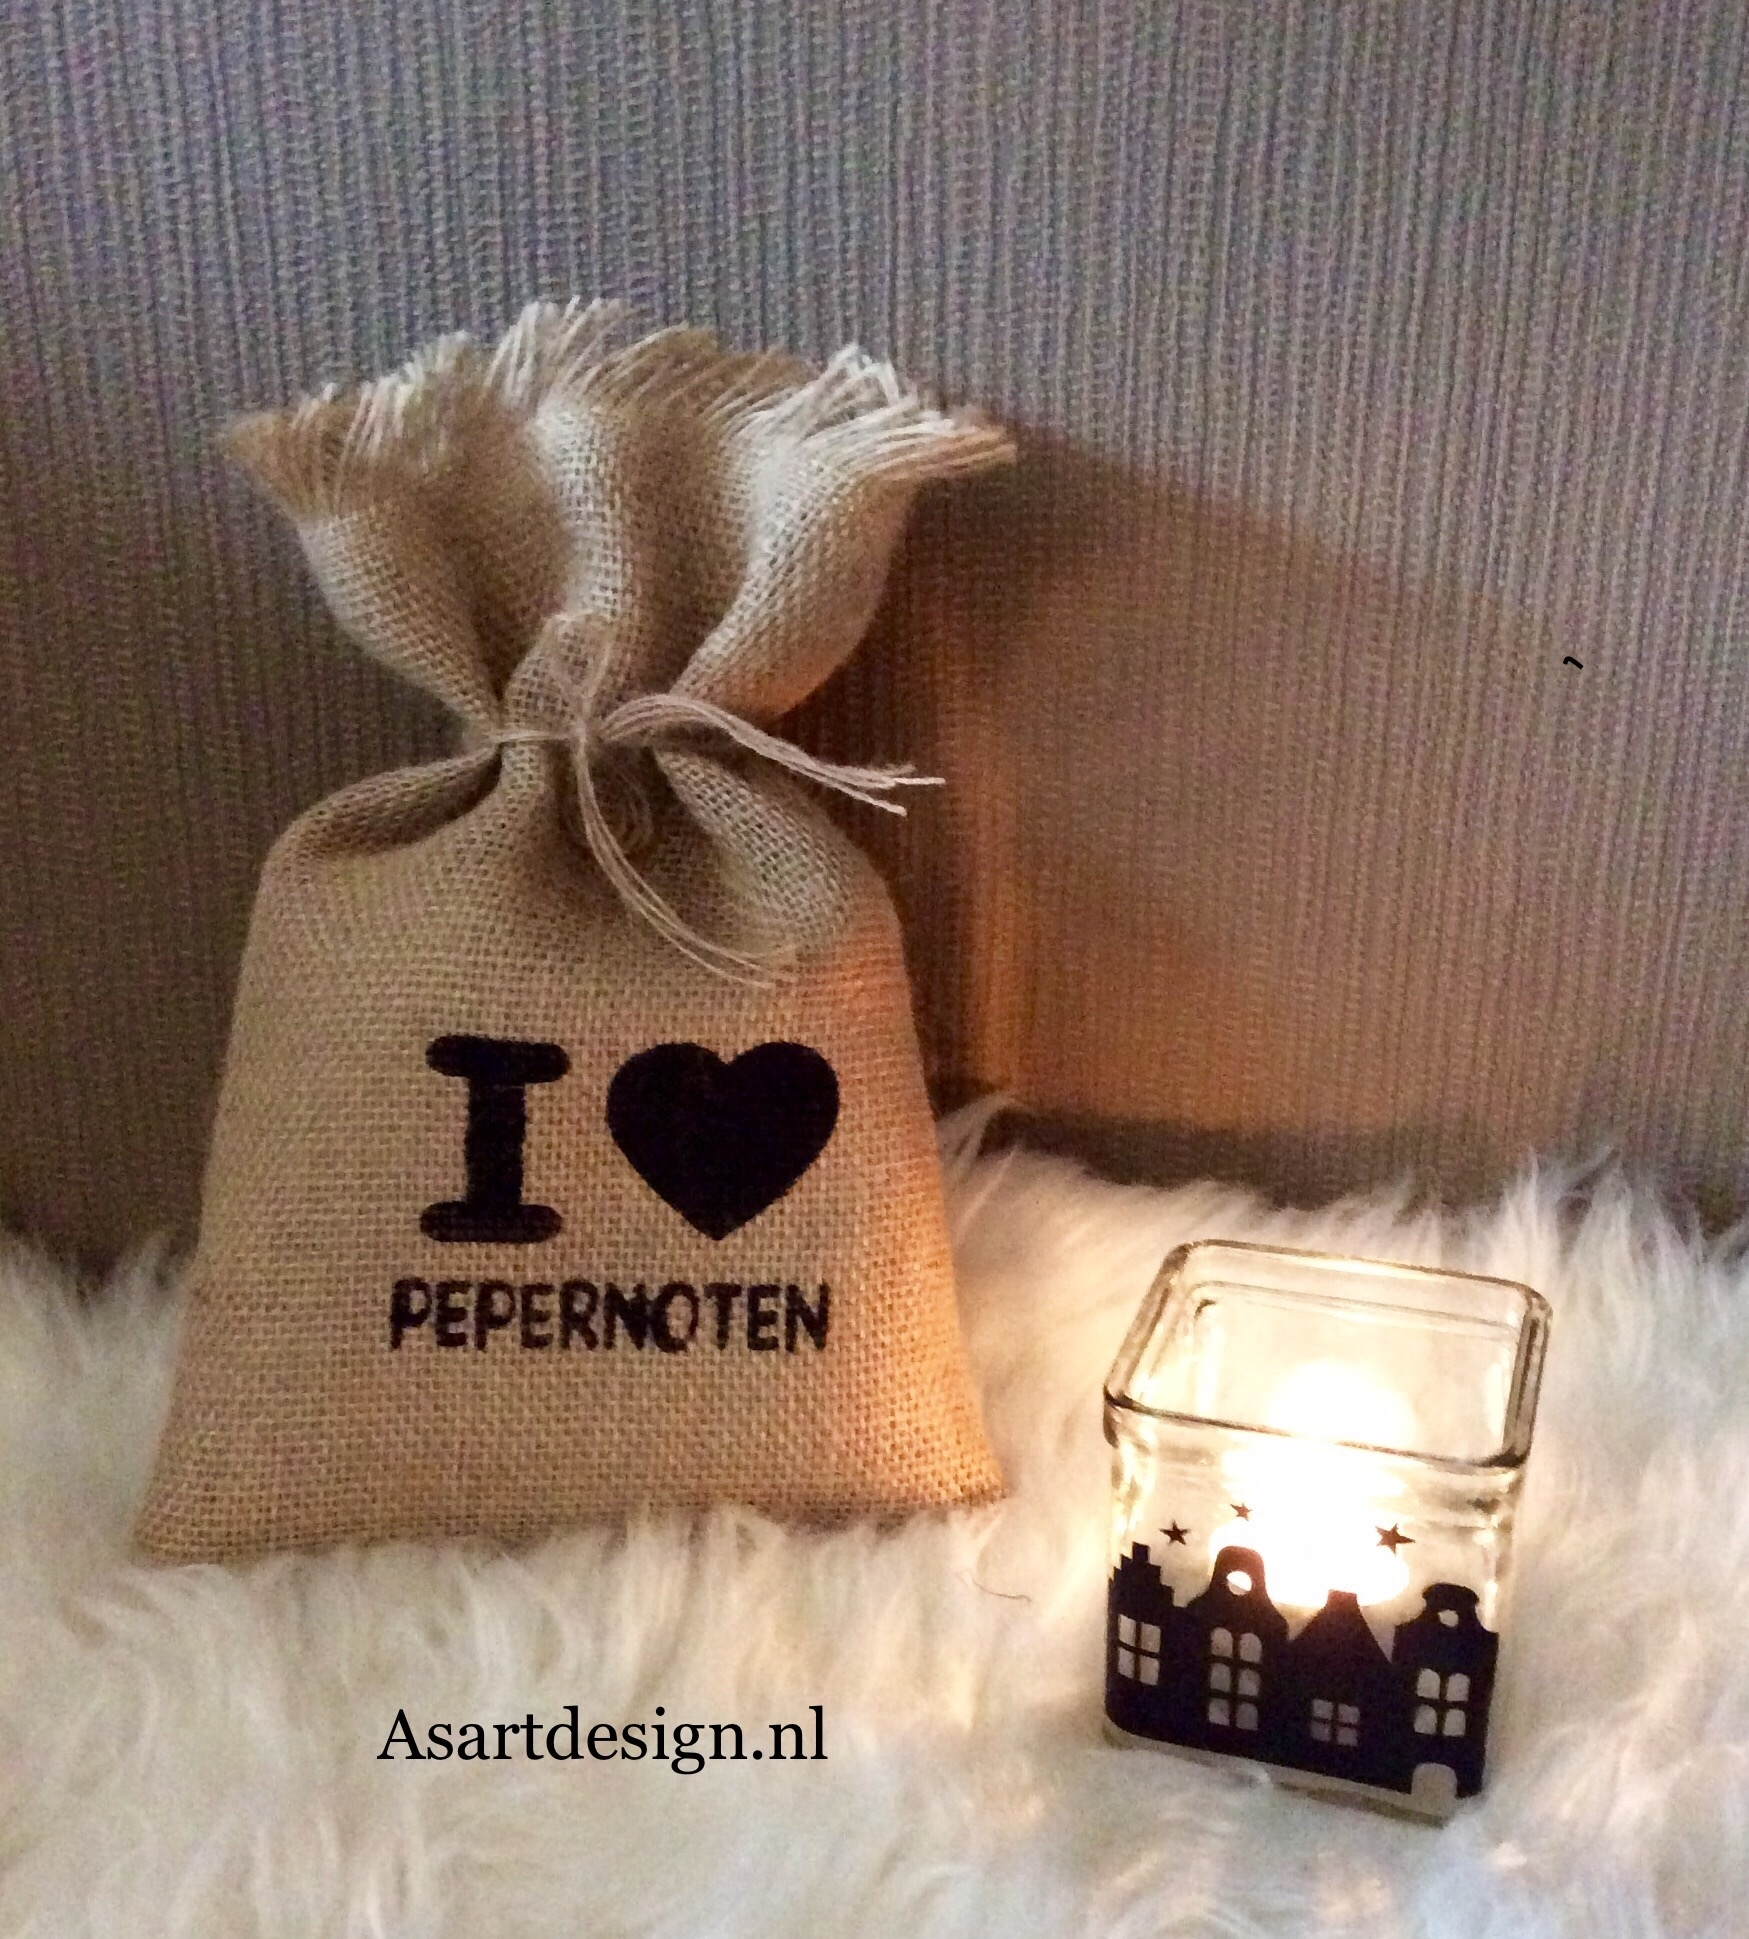 Sinterklaas decoratie | Jute zakje I LOVE PEPENOTEN